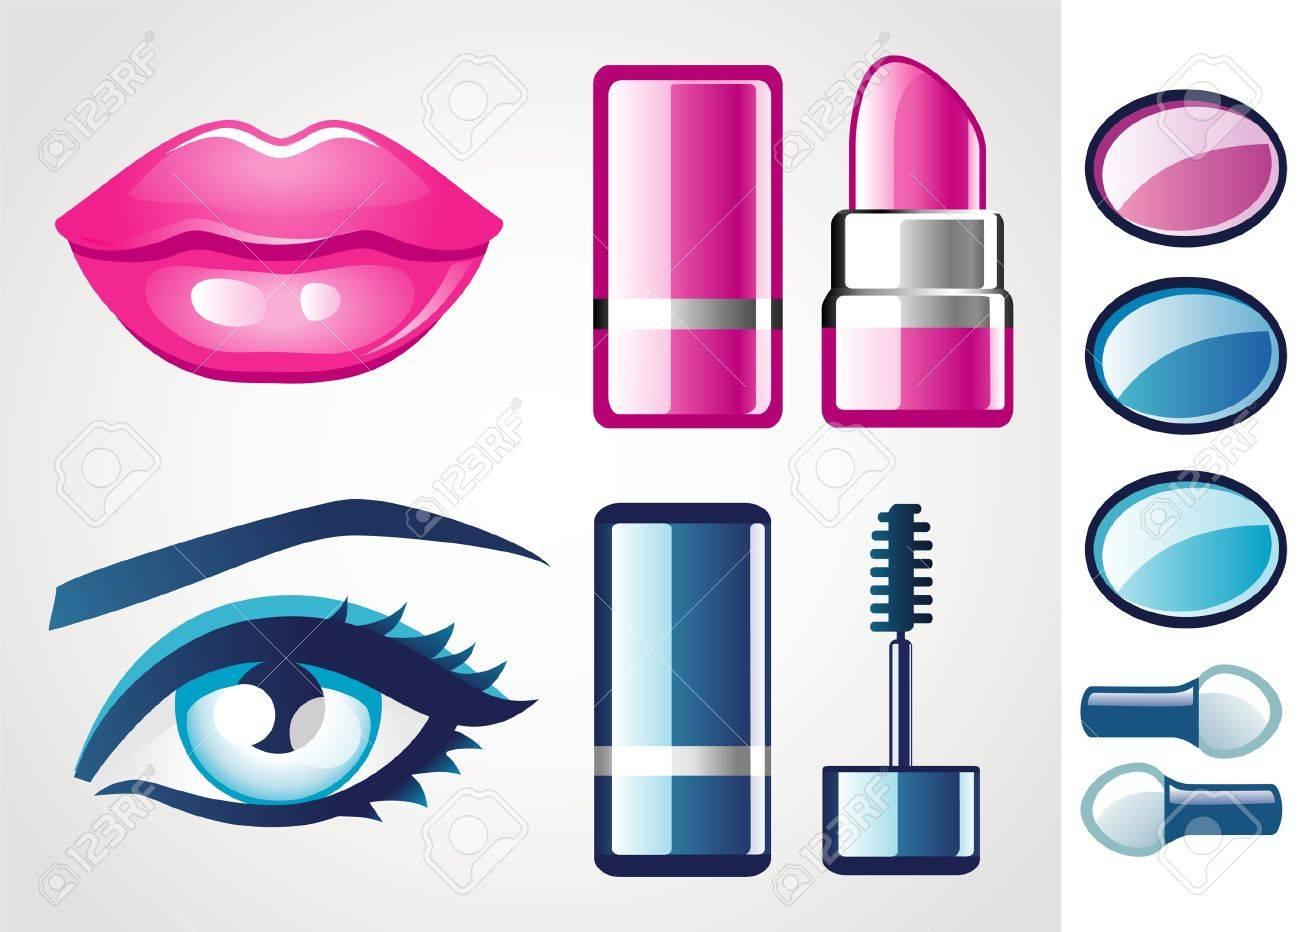 Beauty icon (lip and eye) Stock Vector - 10645390